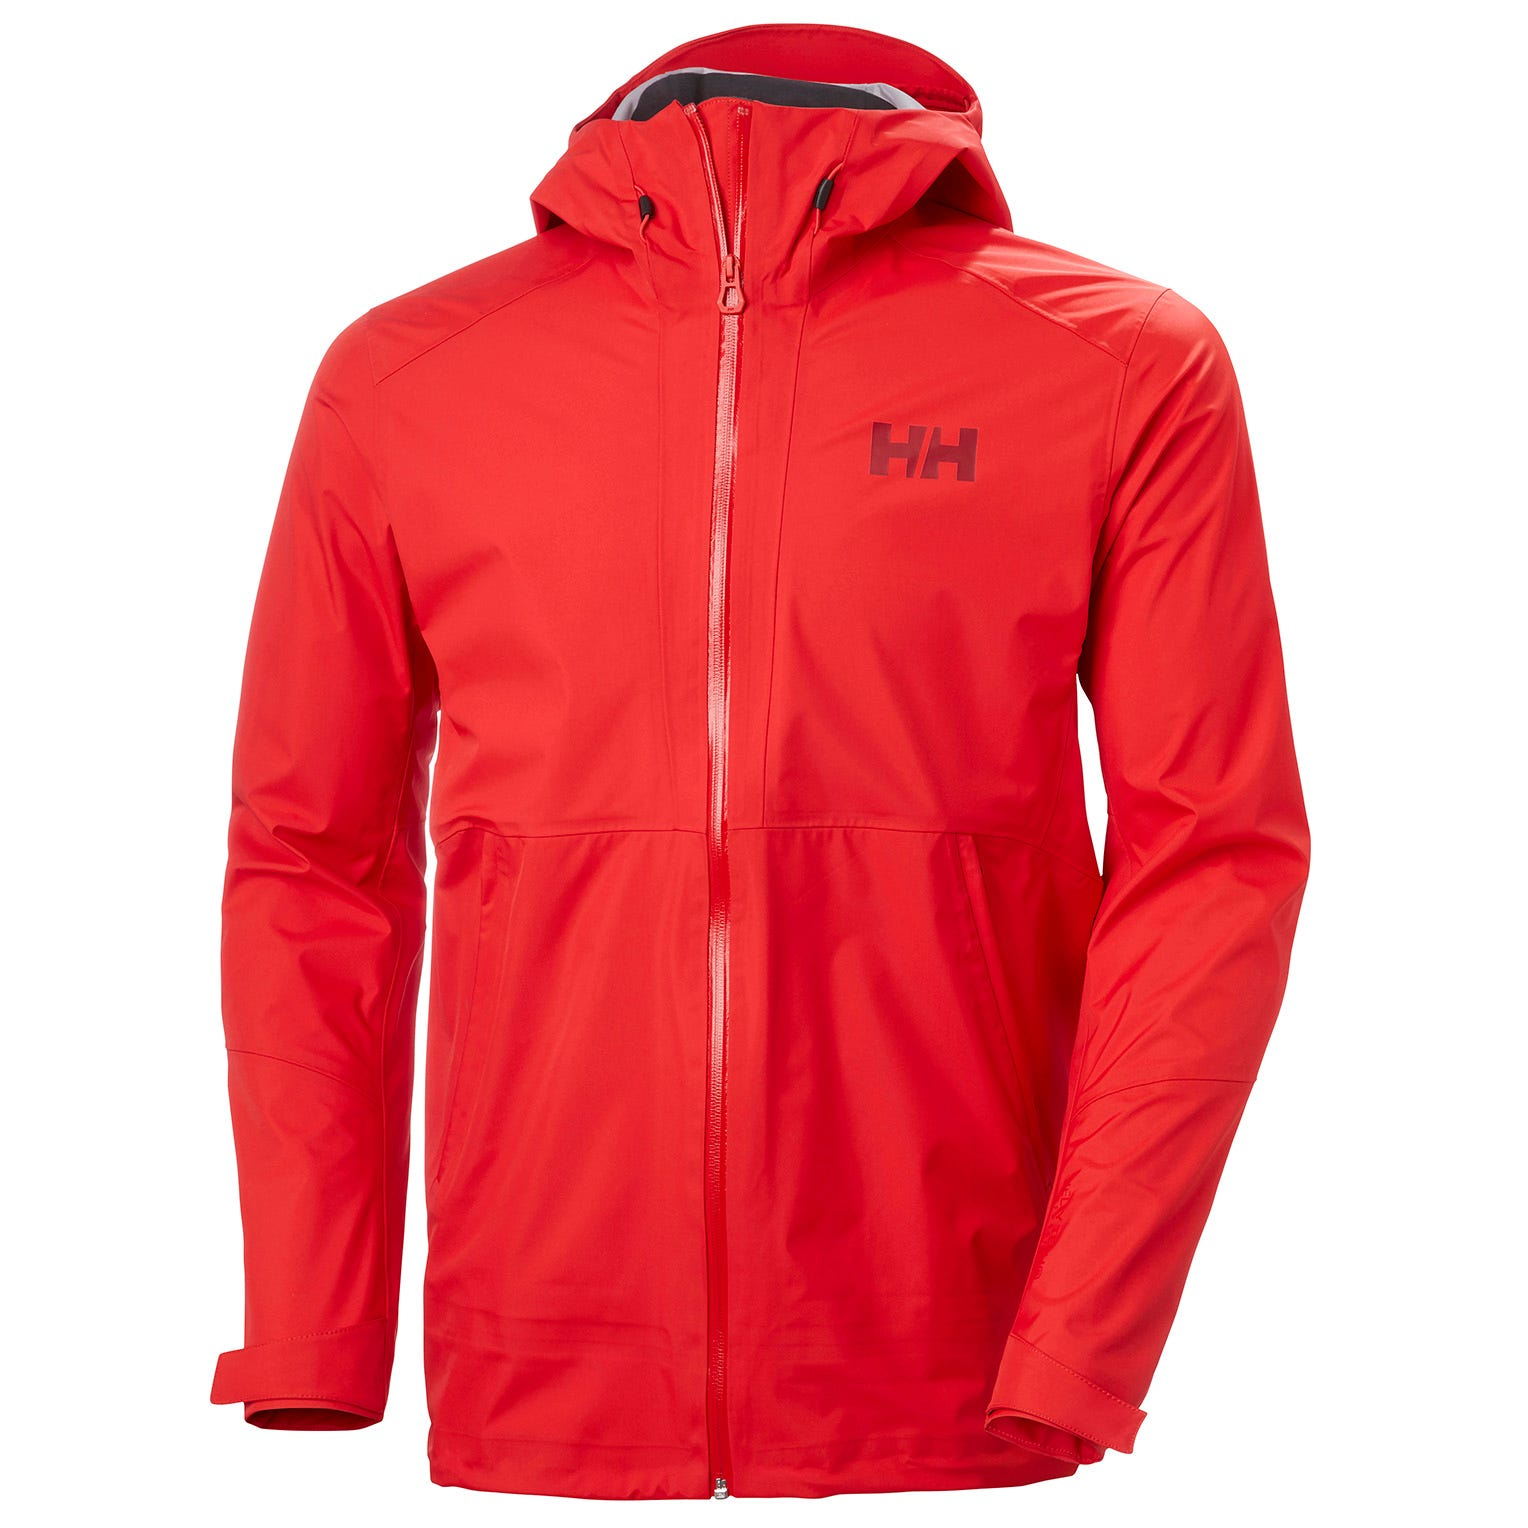 Helly Hansen Vimer 3l Shell Jacket Mens Hiking Red XXL